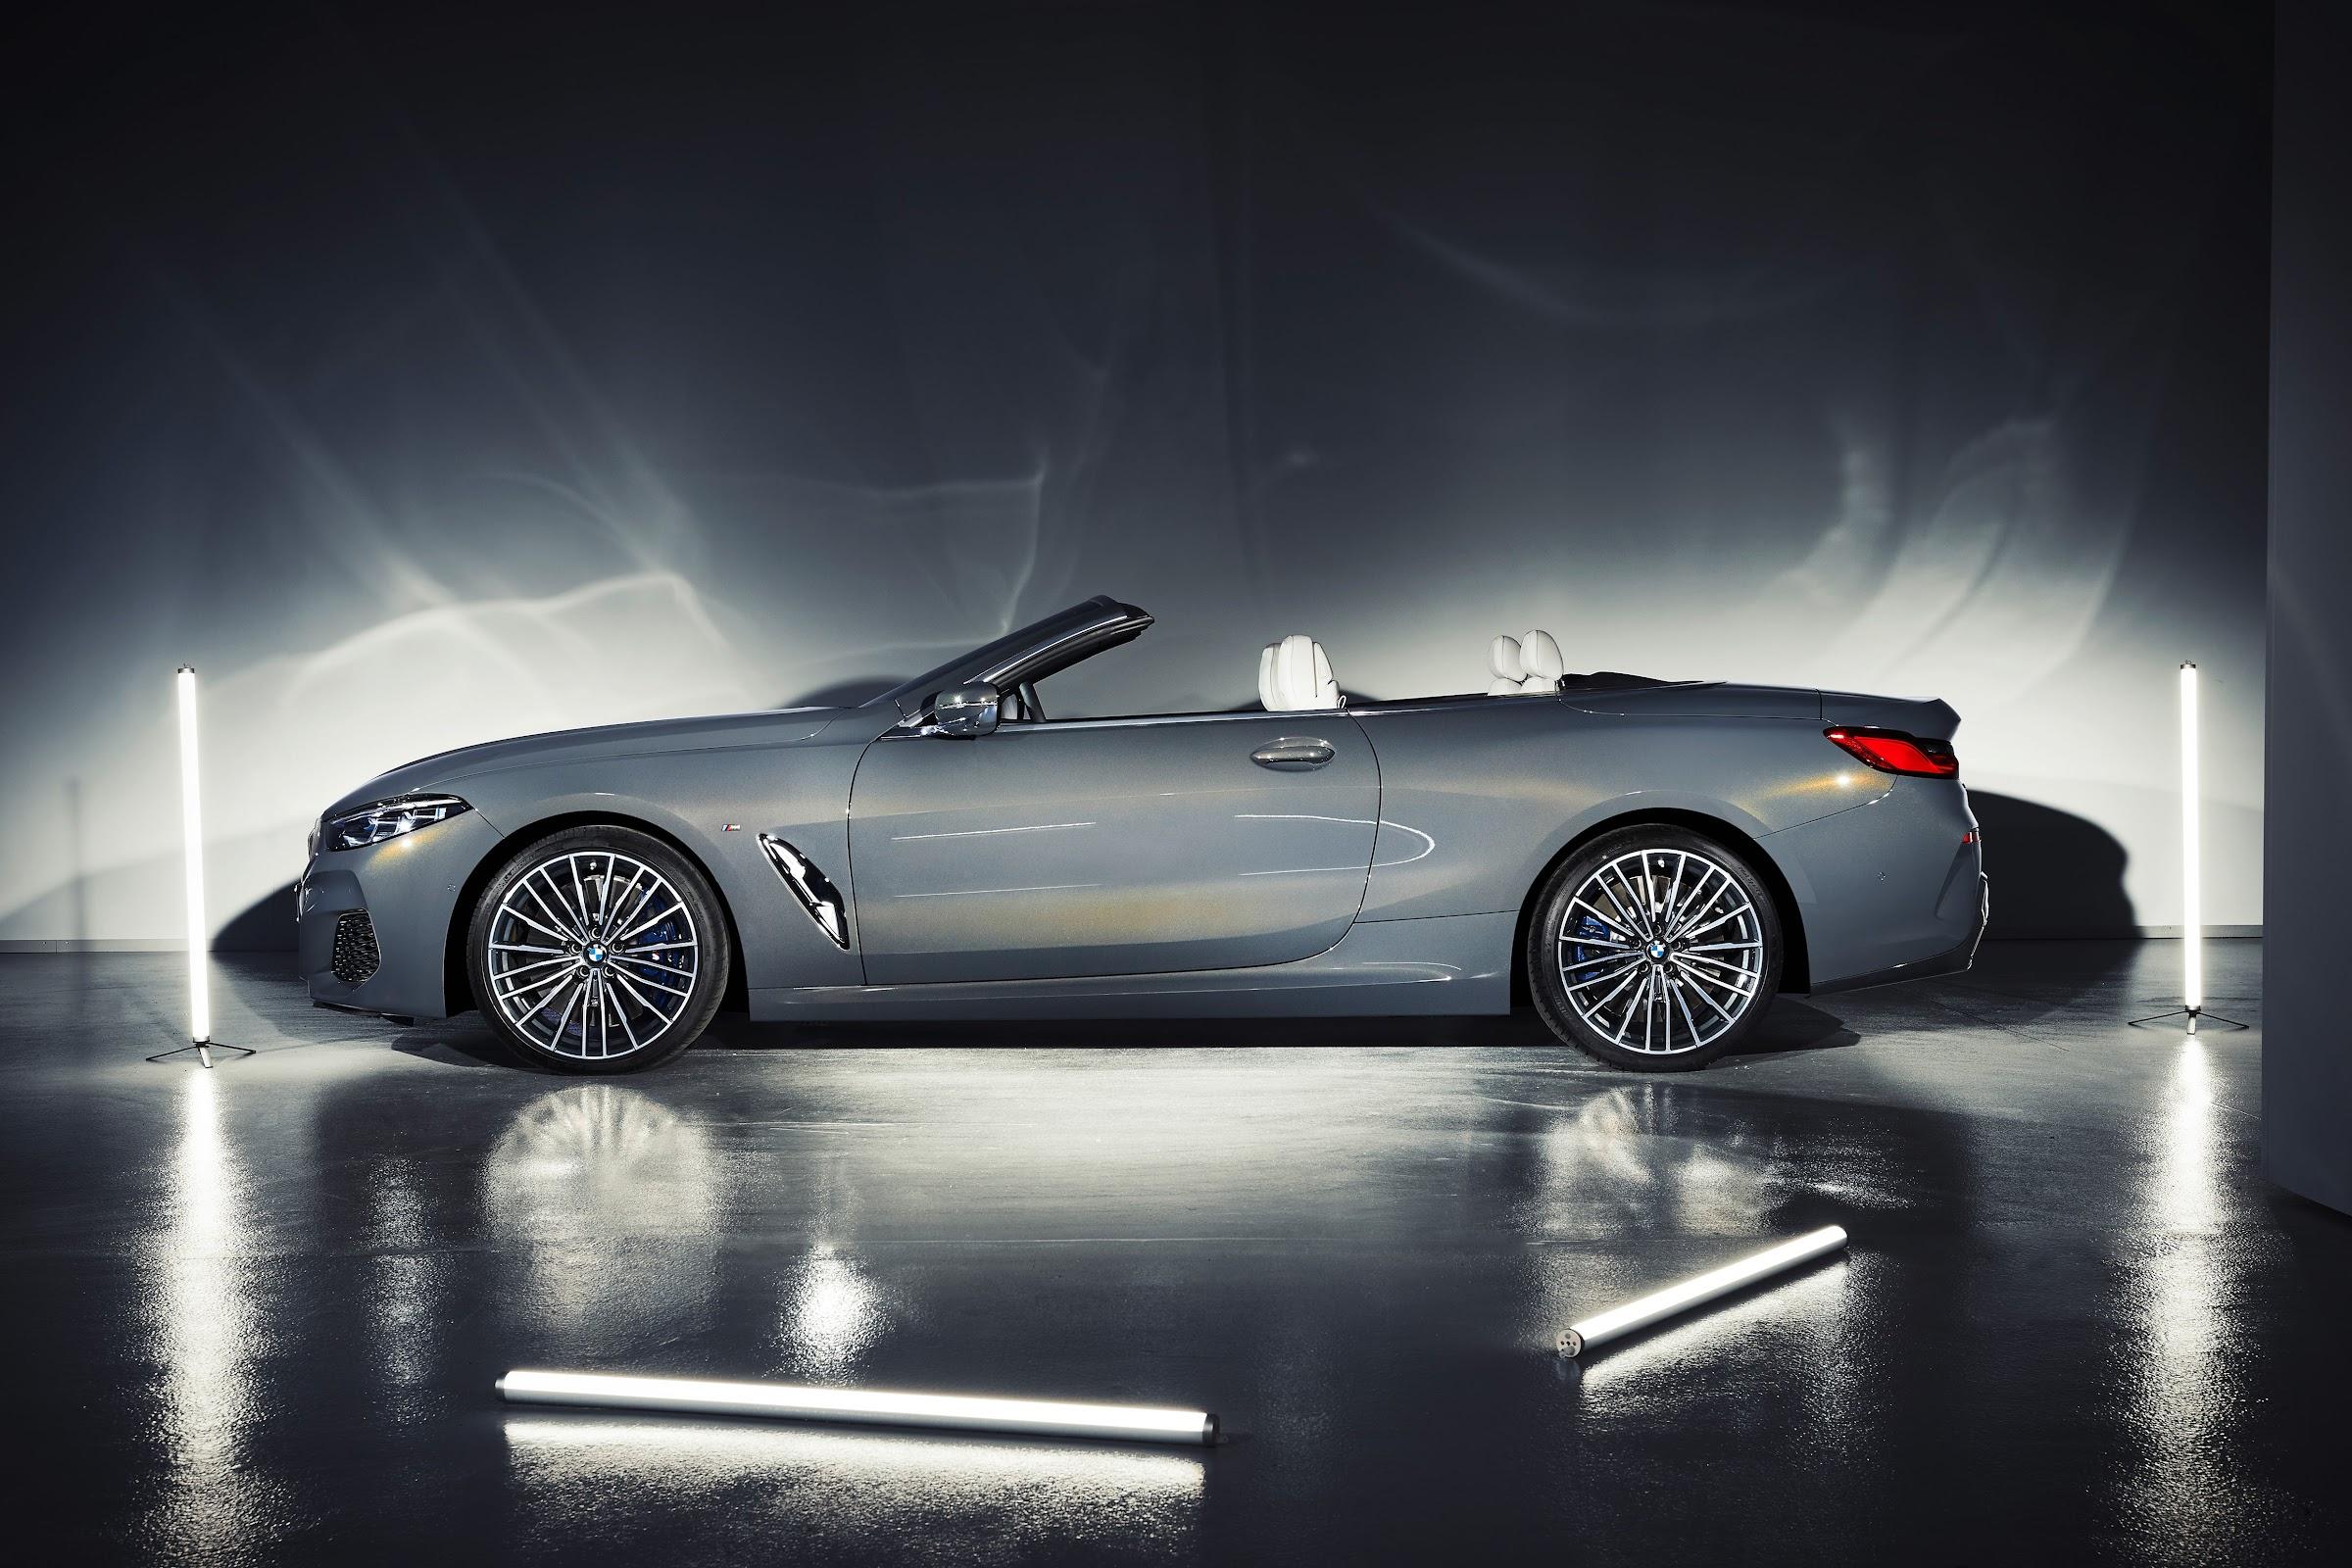 62LobKnqS9IEzJ6vROjf6hDL1jp0fQJaY1RntU4ESQsZEavLRyOTgcuCN3DE1DeVStaSRaw2znuXNqgUEgsZ8IUF2auJITzZW3b2u0uHAi8KbsRXVpaUWKe4En gXX0BRbcTxWfvYA=w2400 - BMW descapota el Serie 8: nueva versión cabrio